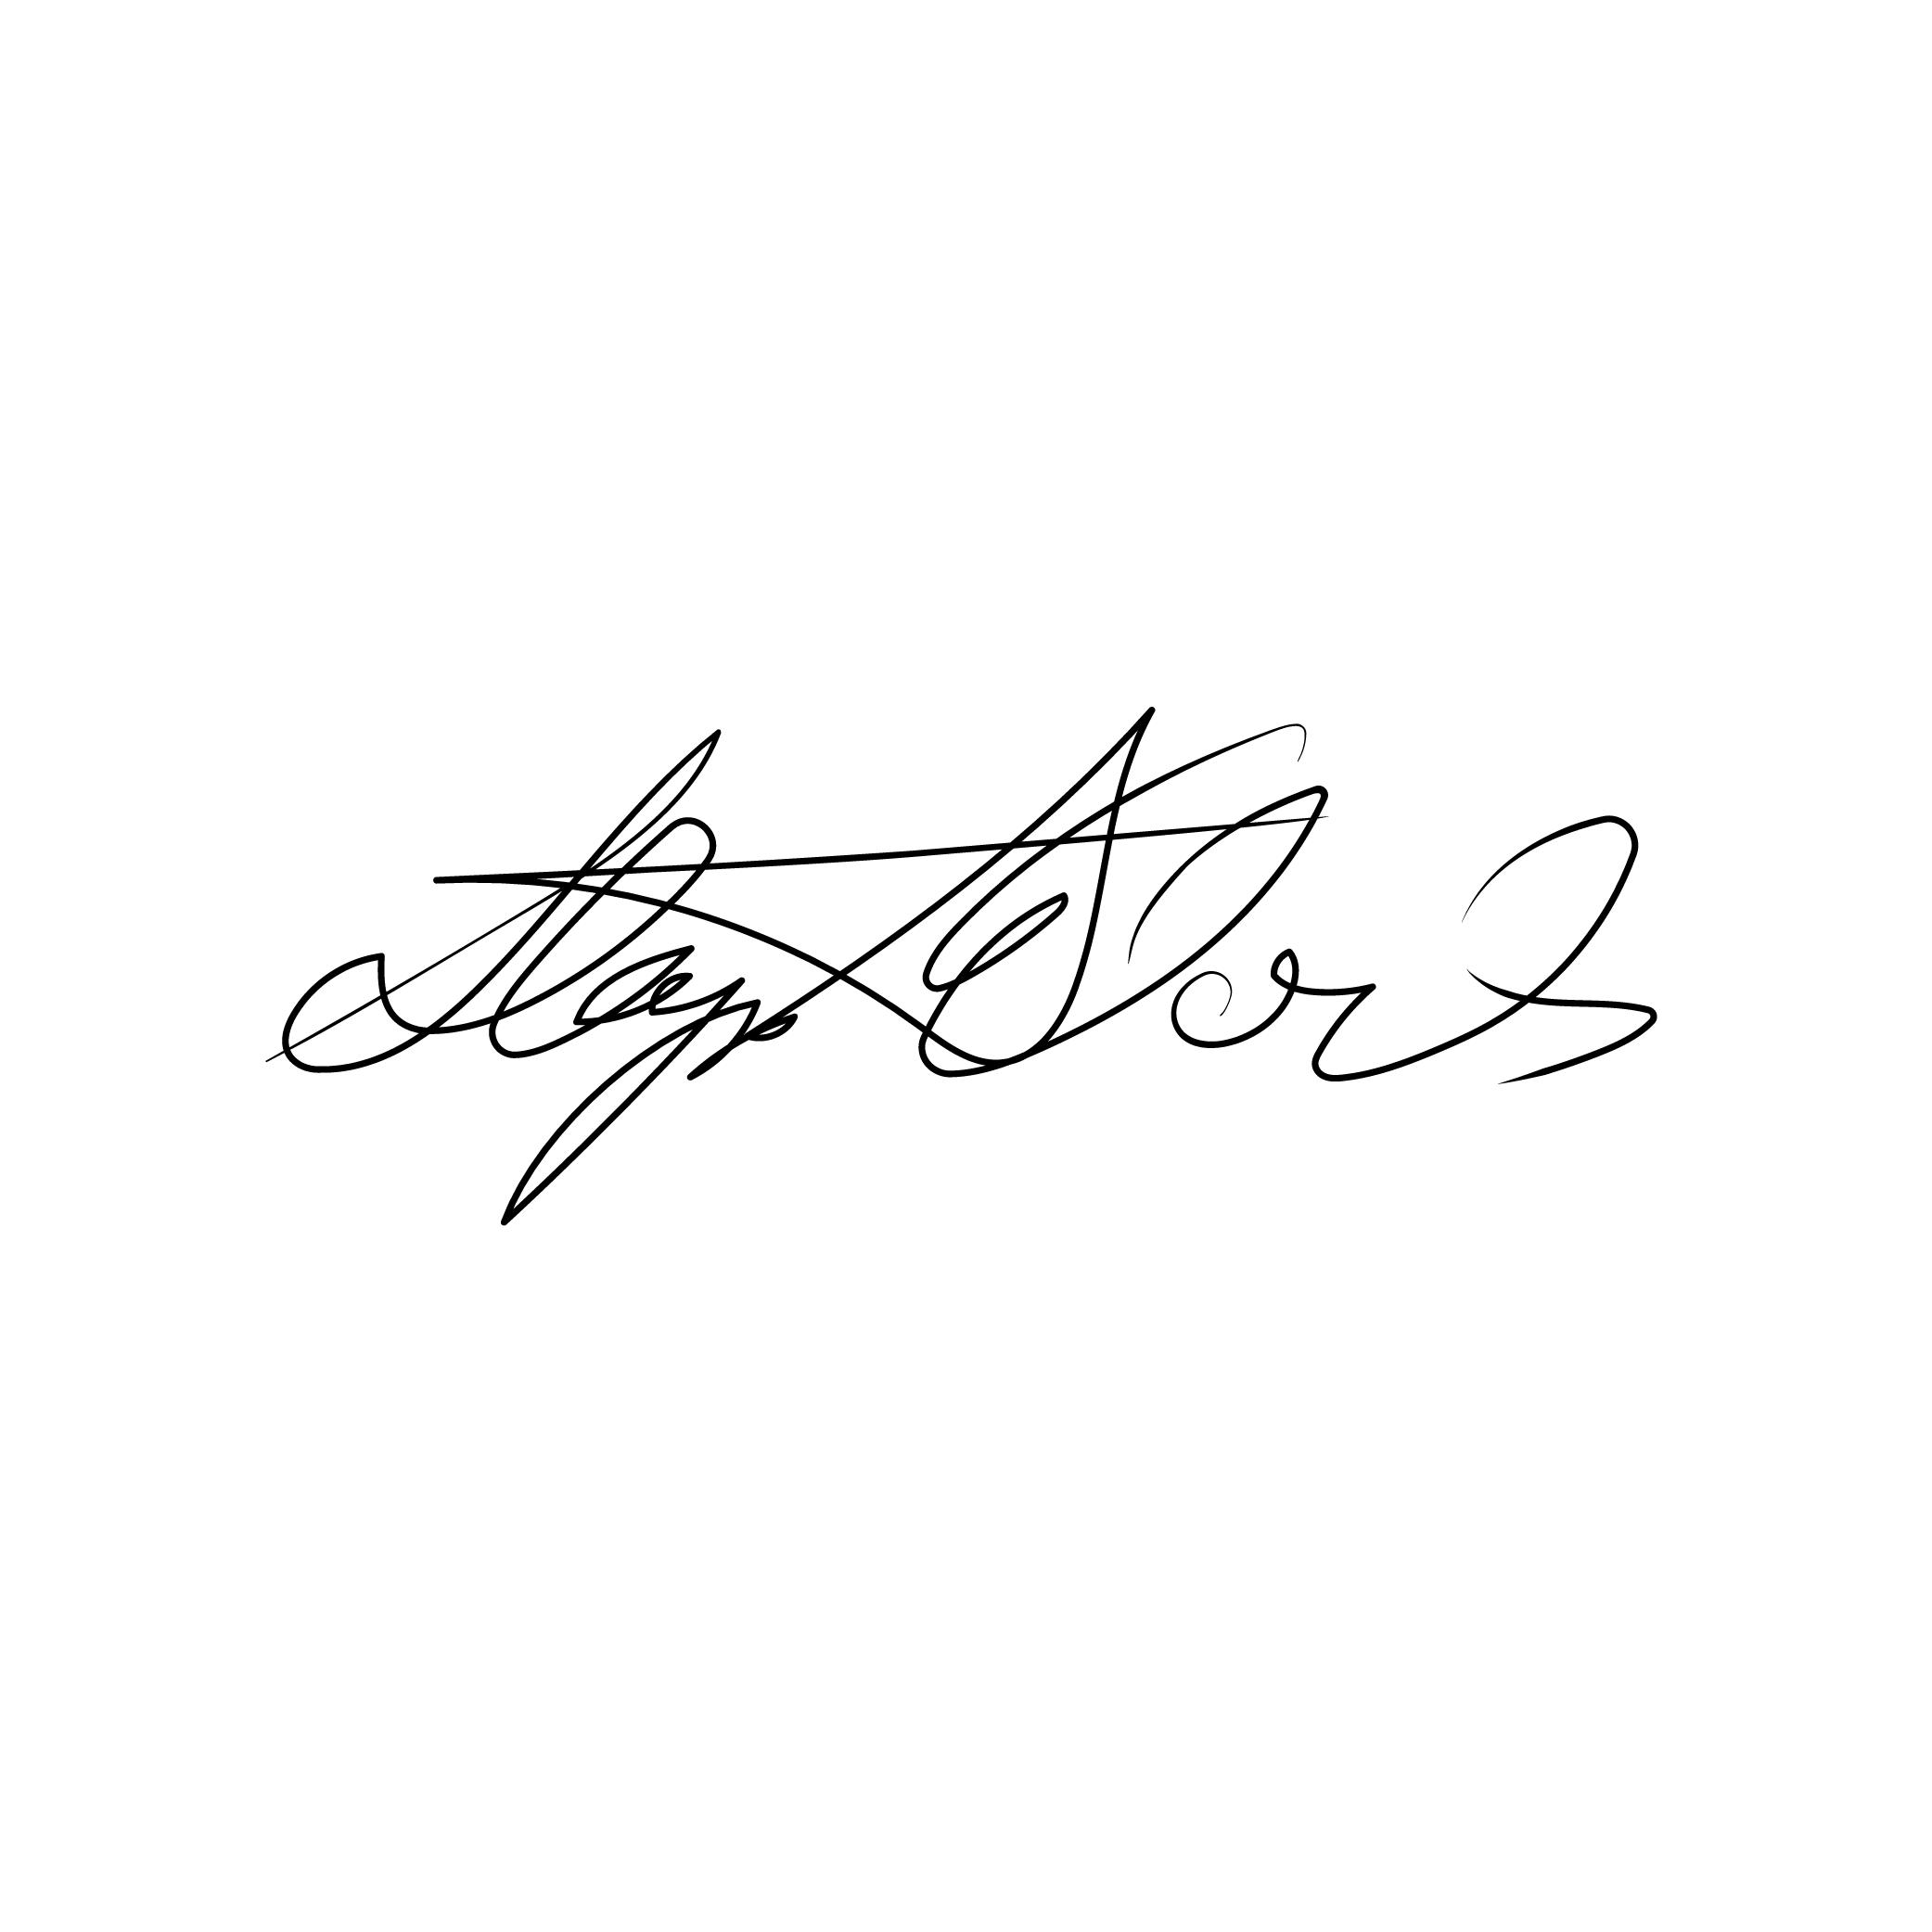 Signature on white    .png    .jpg   .pdf       .eps